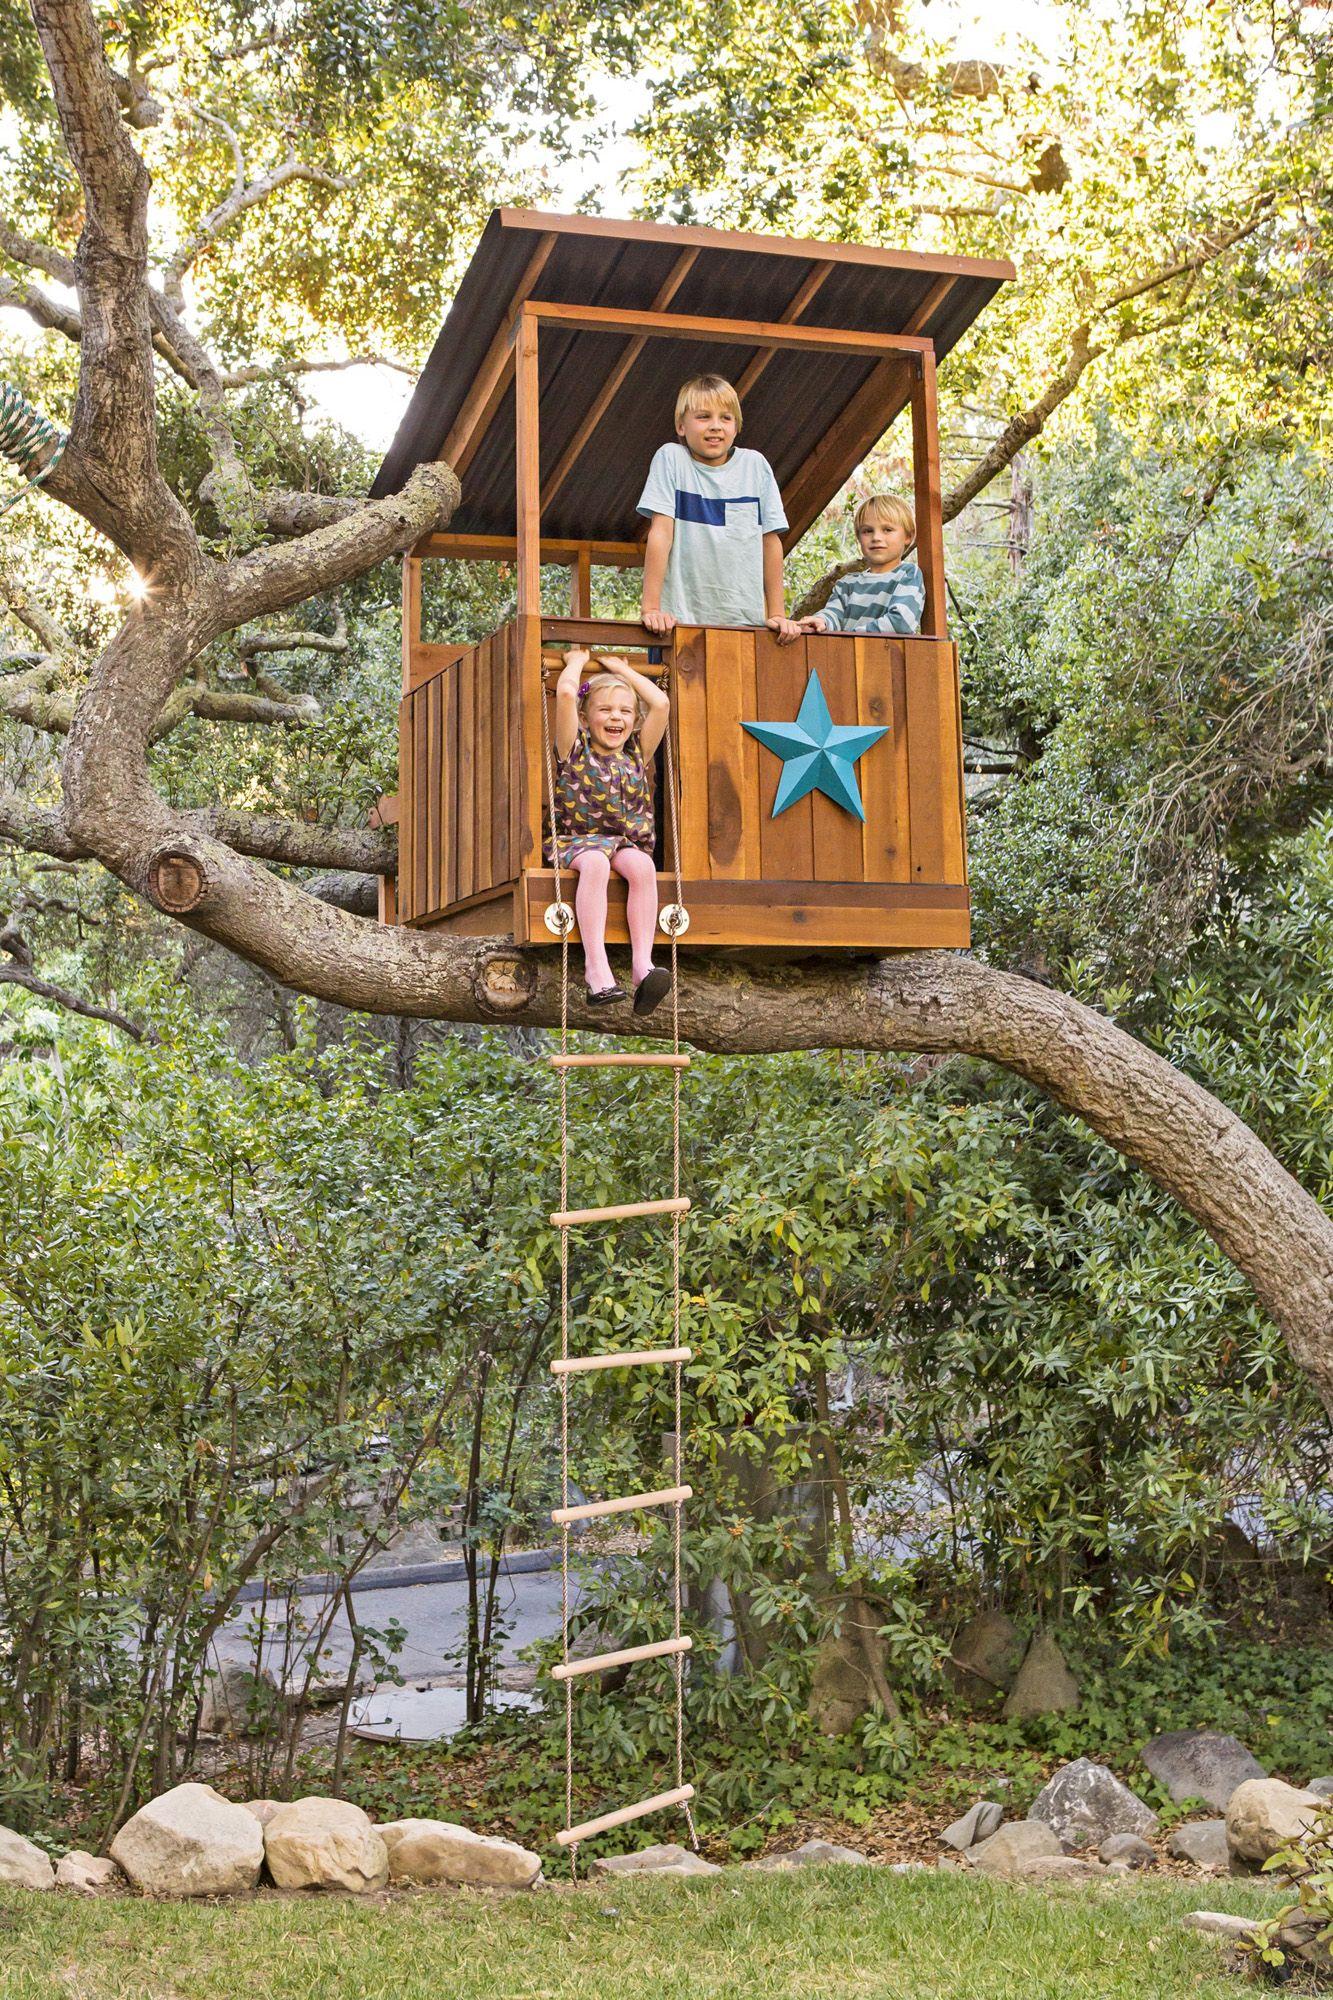 Lisa Romerein/Otto. Build Your Dream Treehouse & 67 DIY Backyard Design Ideas - DIY Backyard Decor Tips